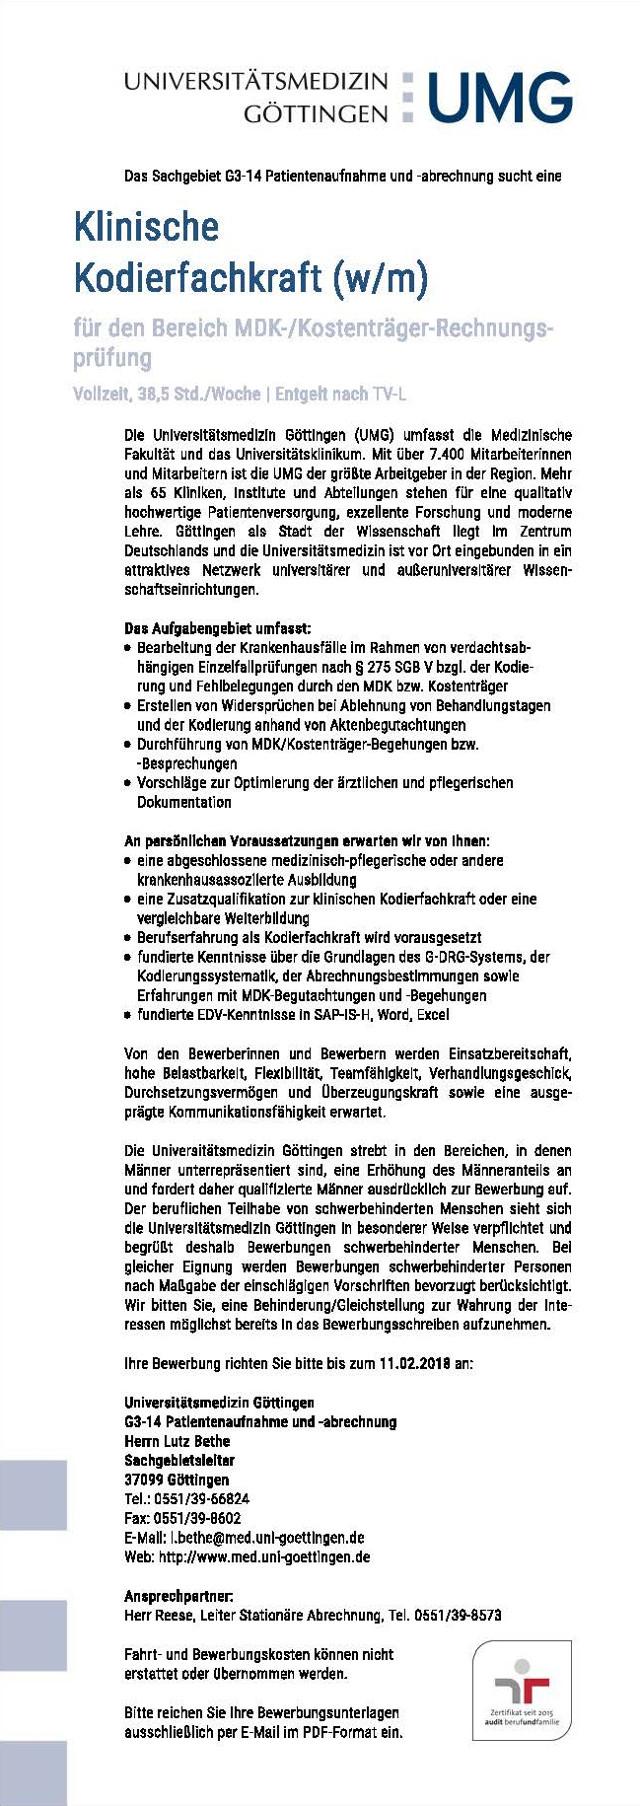 Universitätsmedizin Göttingen: Klinische Kodierfachkraft (w/m)